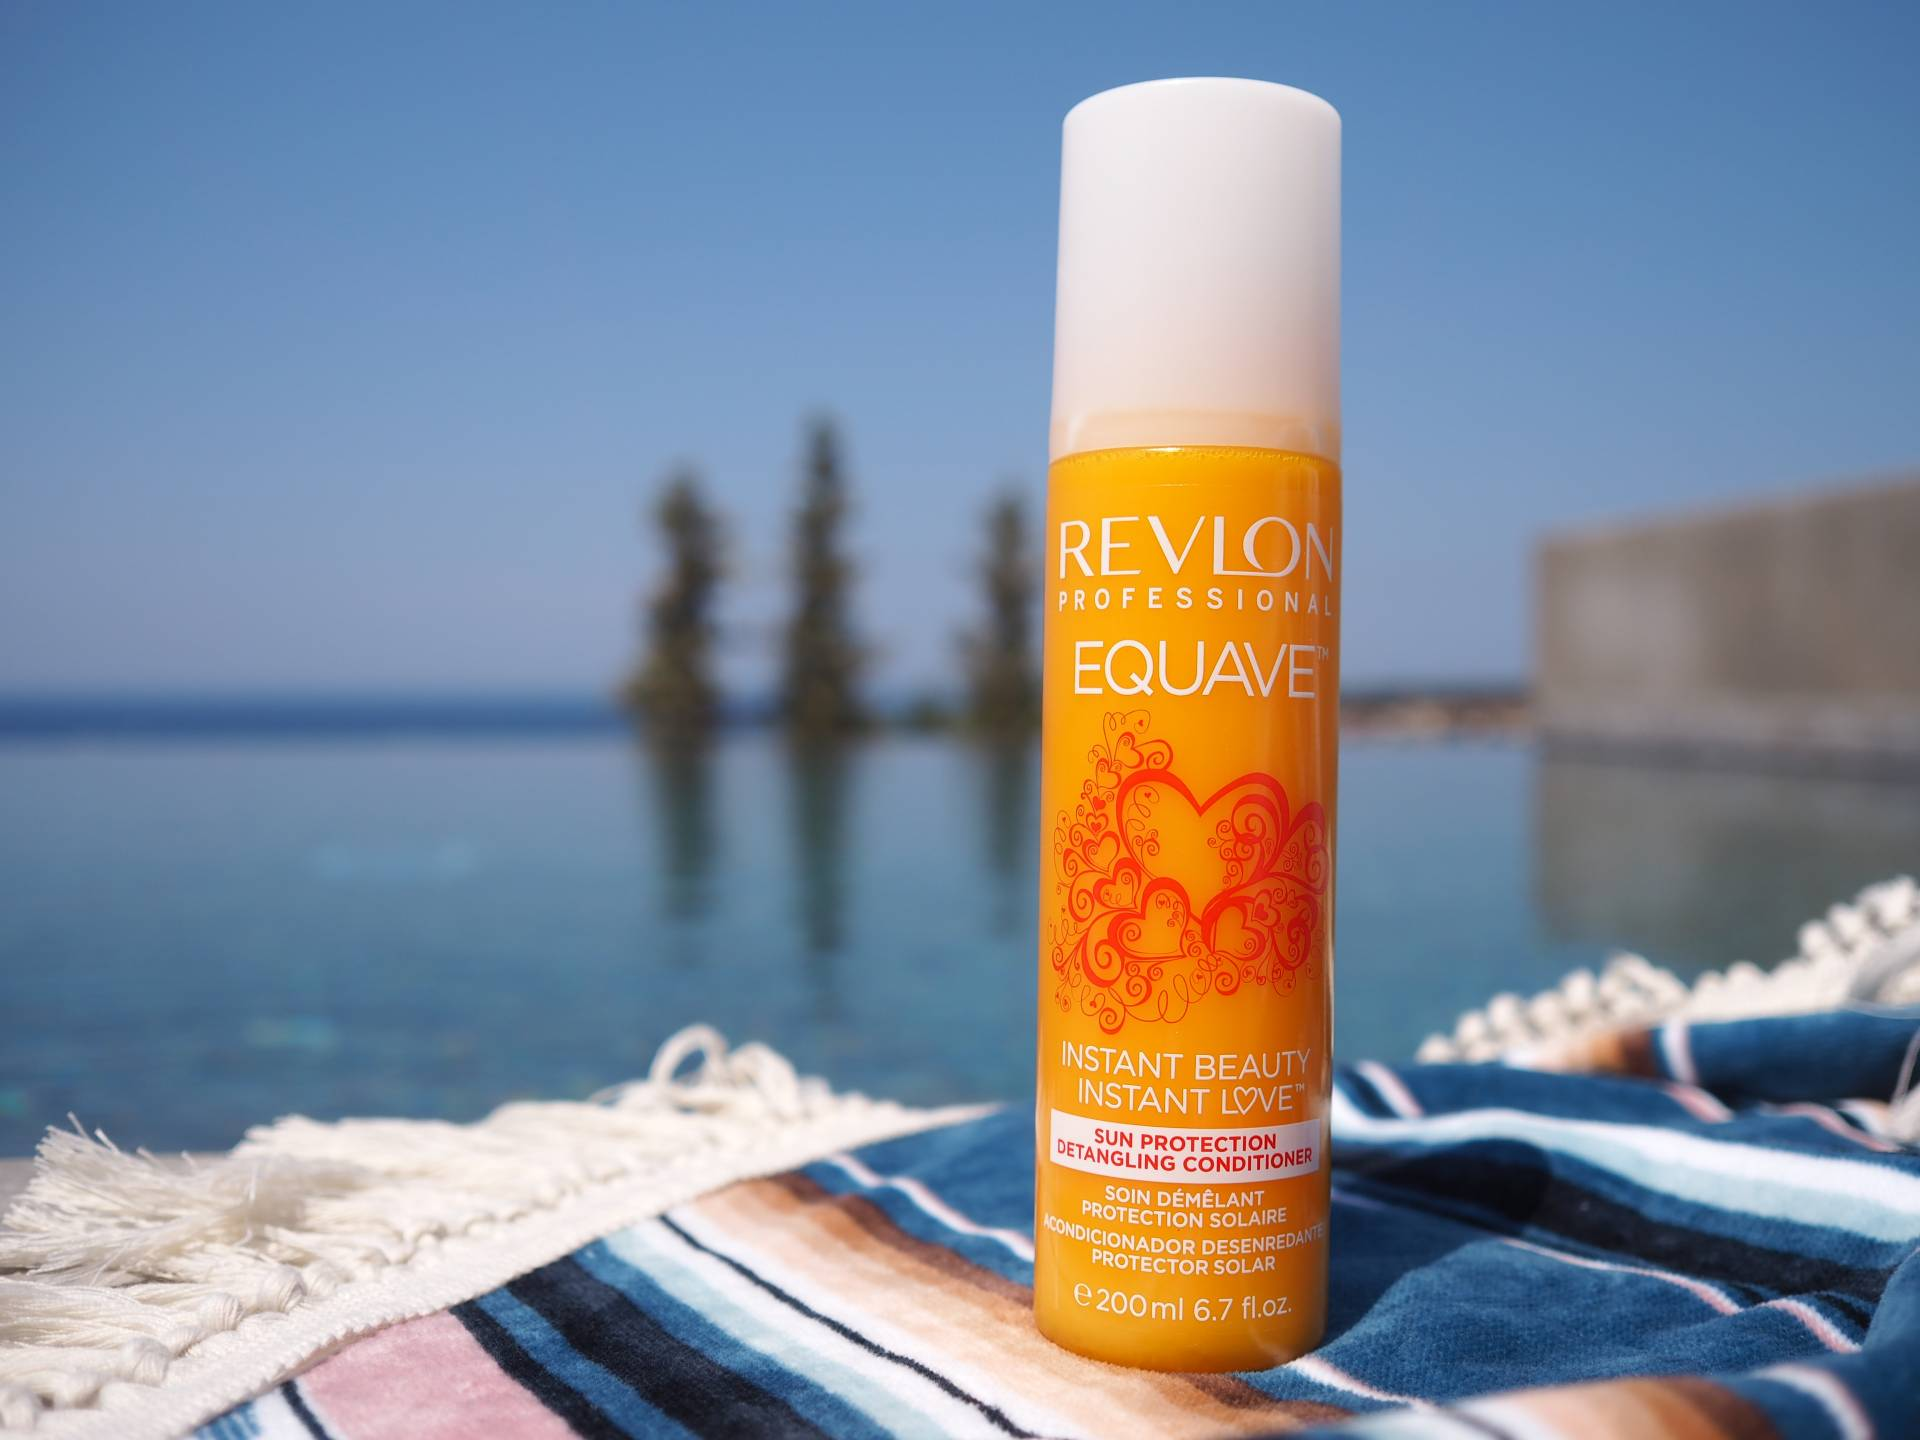 Revlon Professional Equave Sun Protection Detangling Conditioner